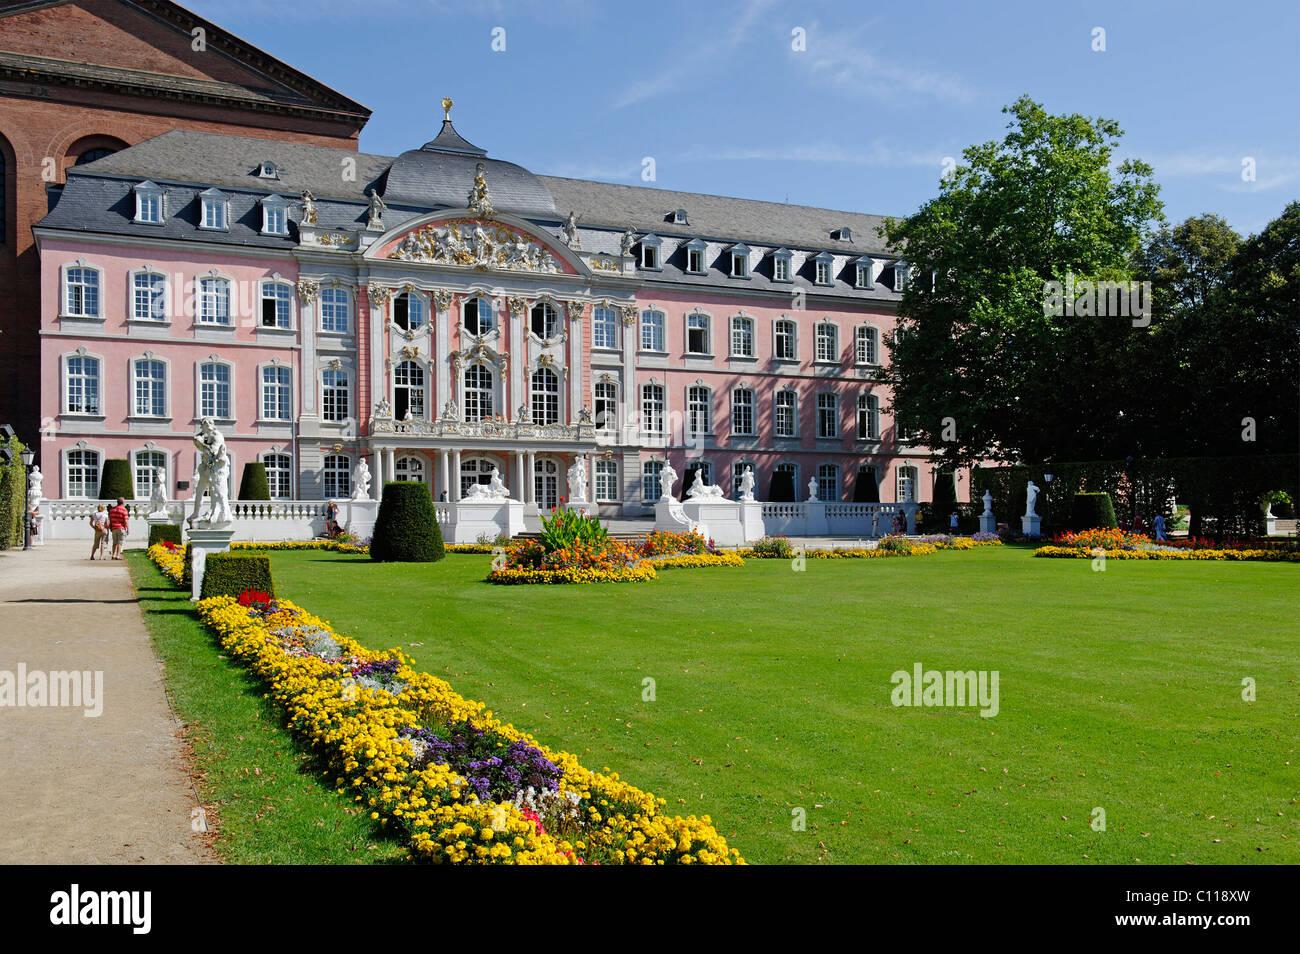 Electoral Palace, Trier, Rhineland-Palatinate, Germany, Europe Stock Photo